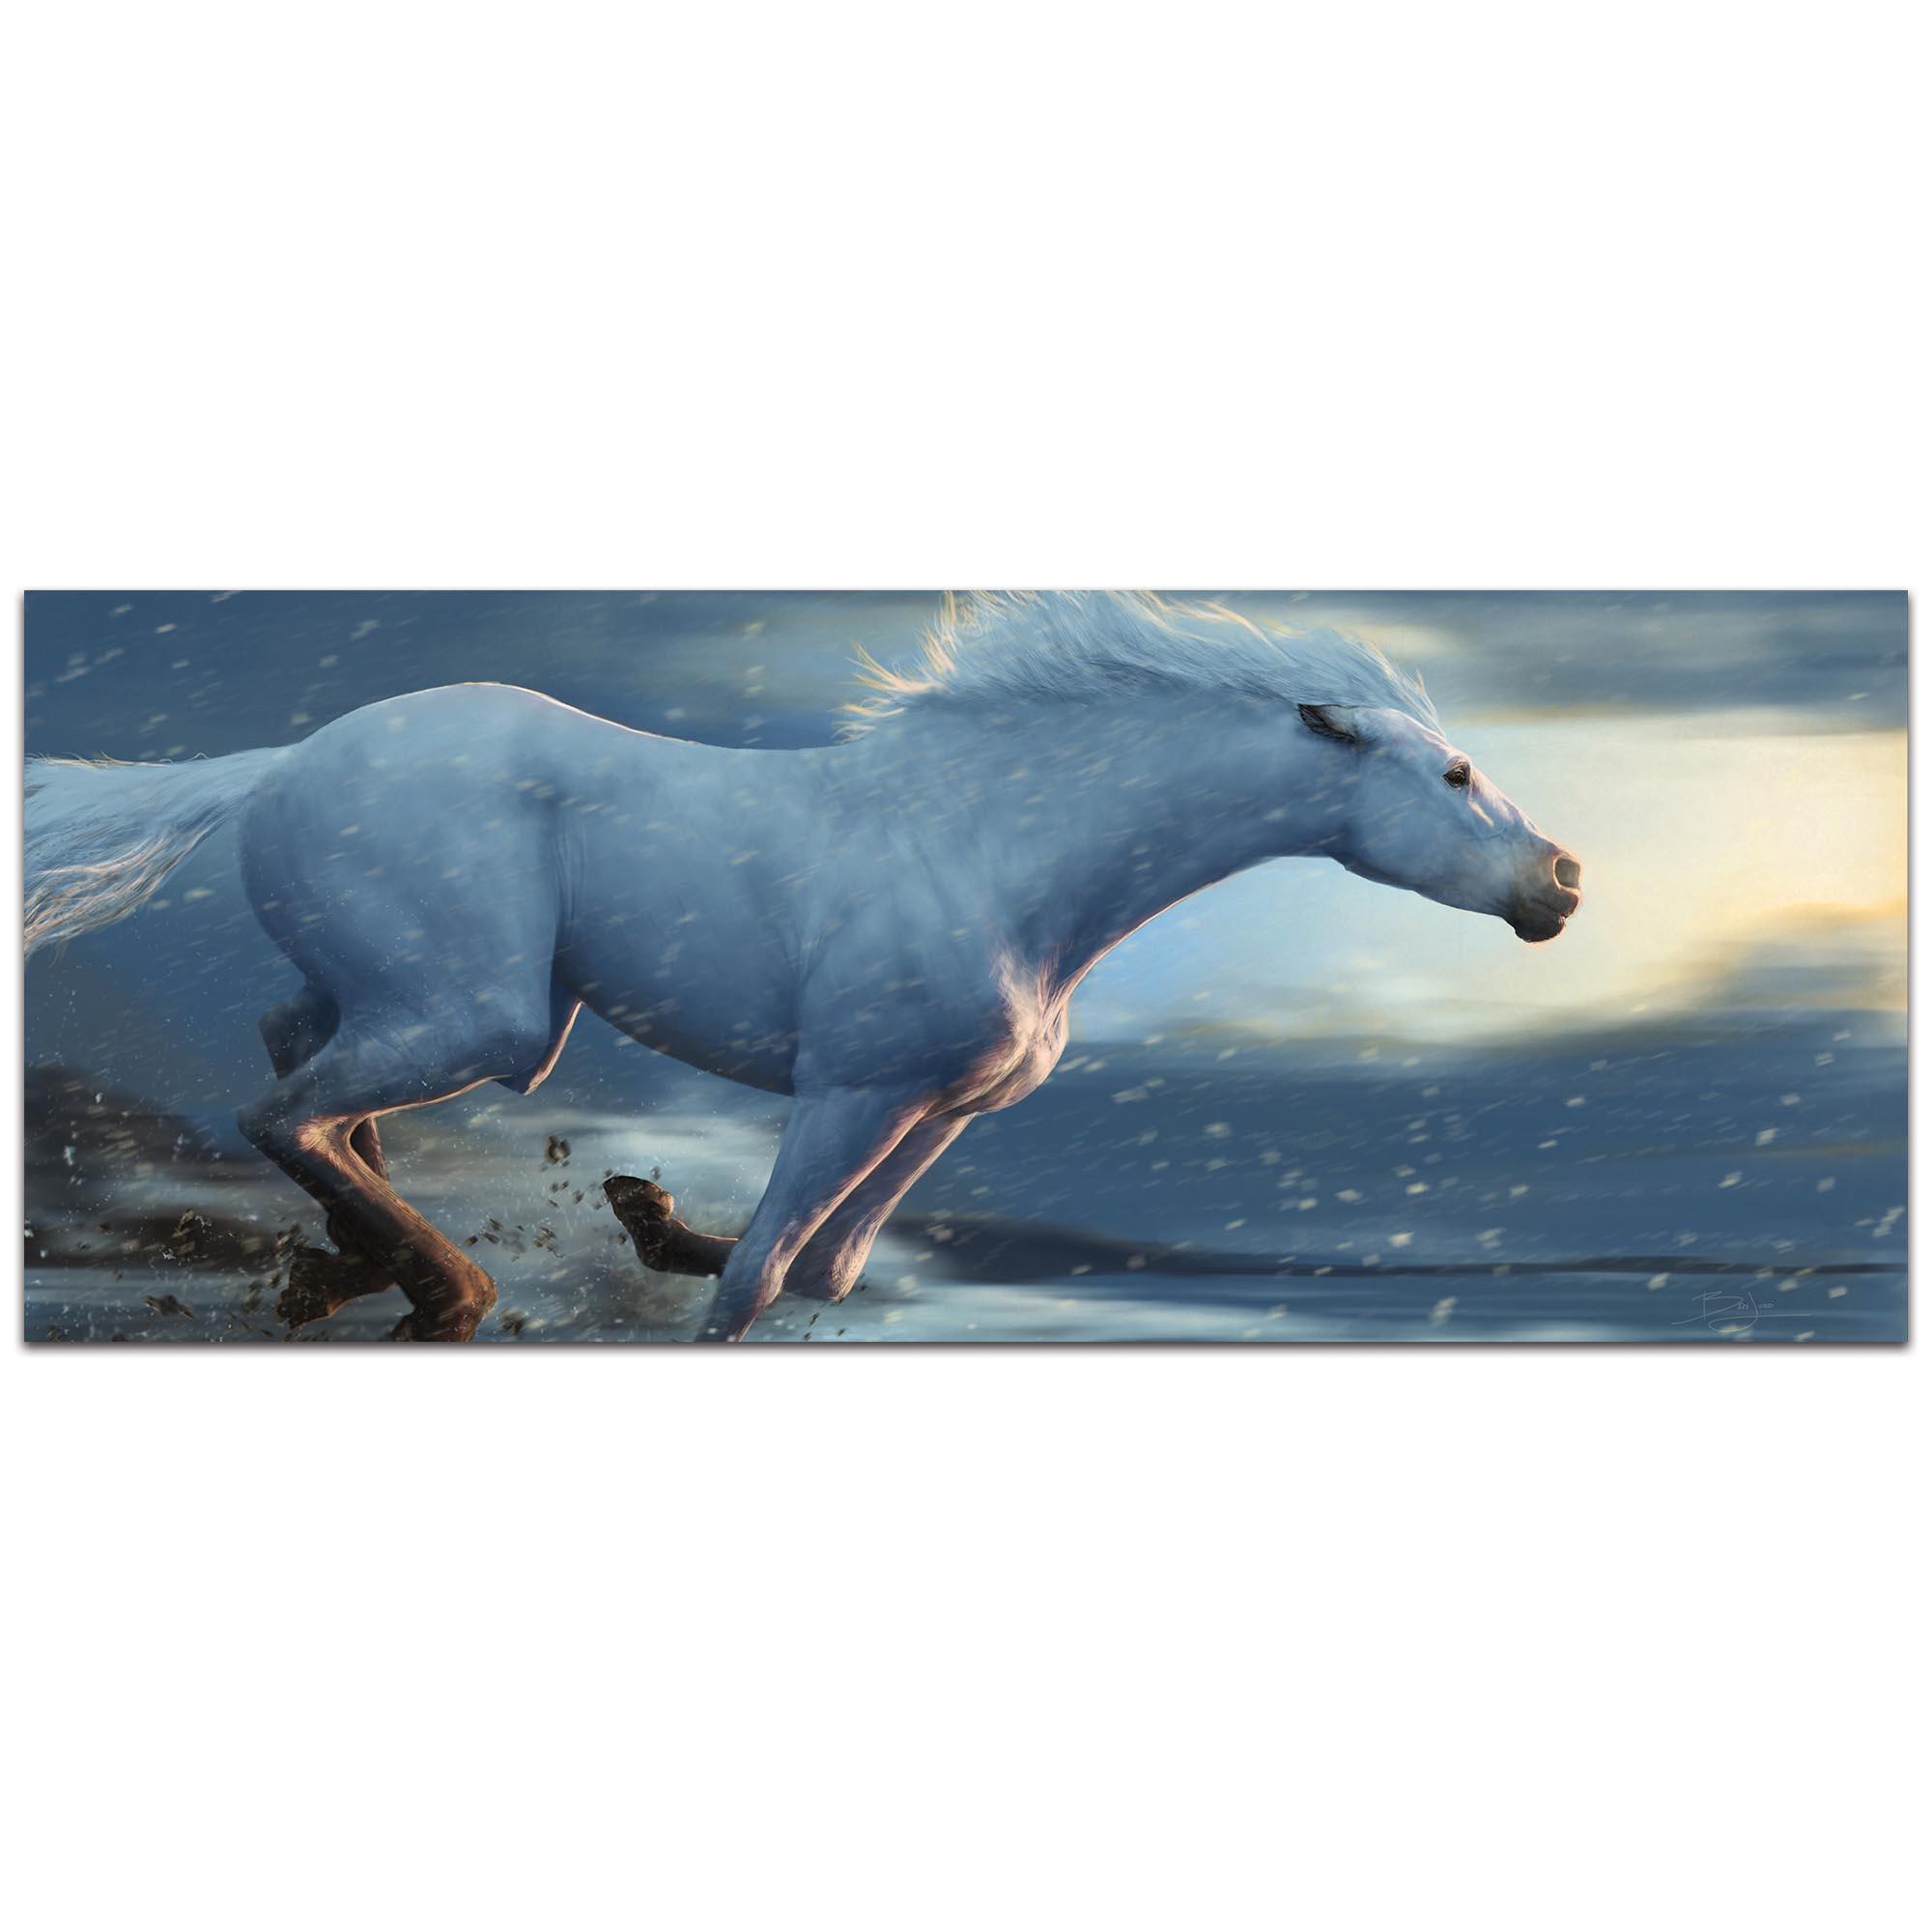 Expressionist Wall Art 'Running Horse' - Wildlife Decor on Metal or Plexiglass